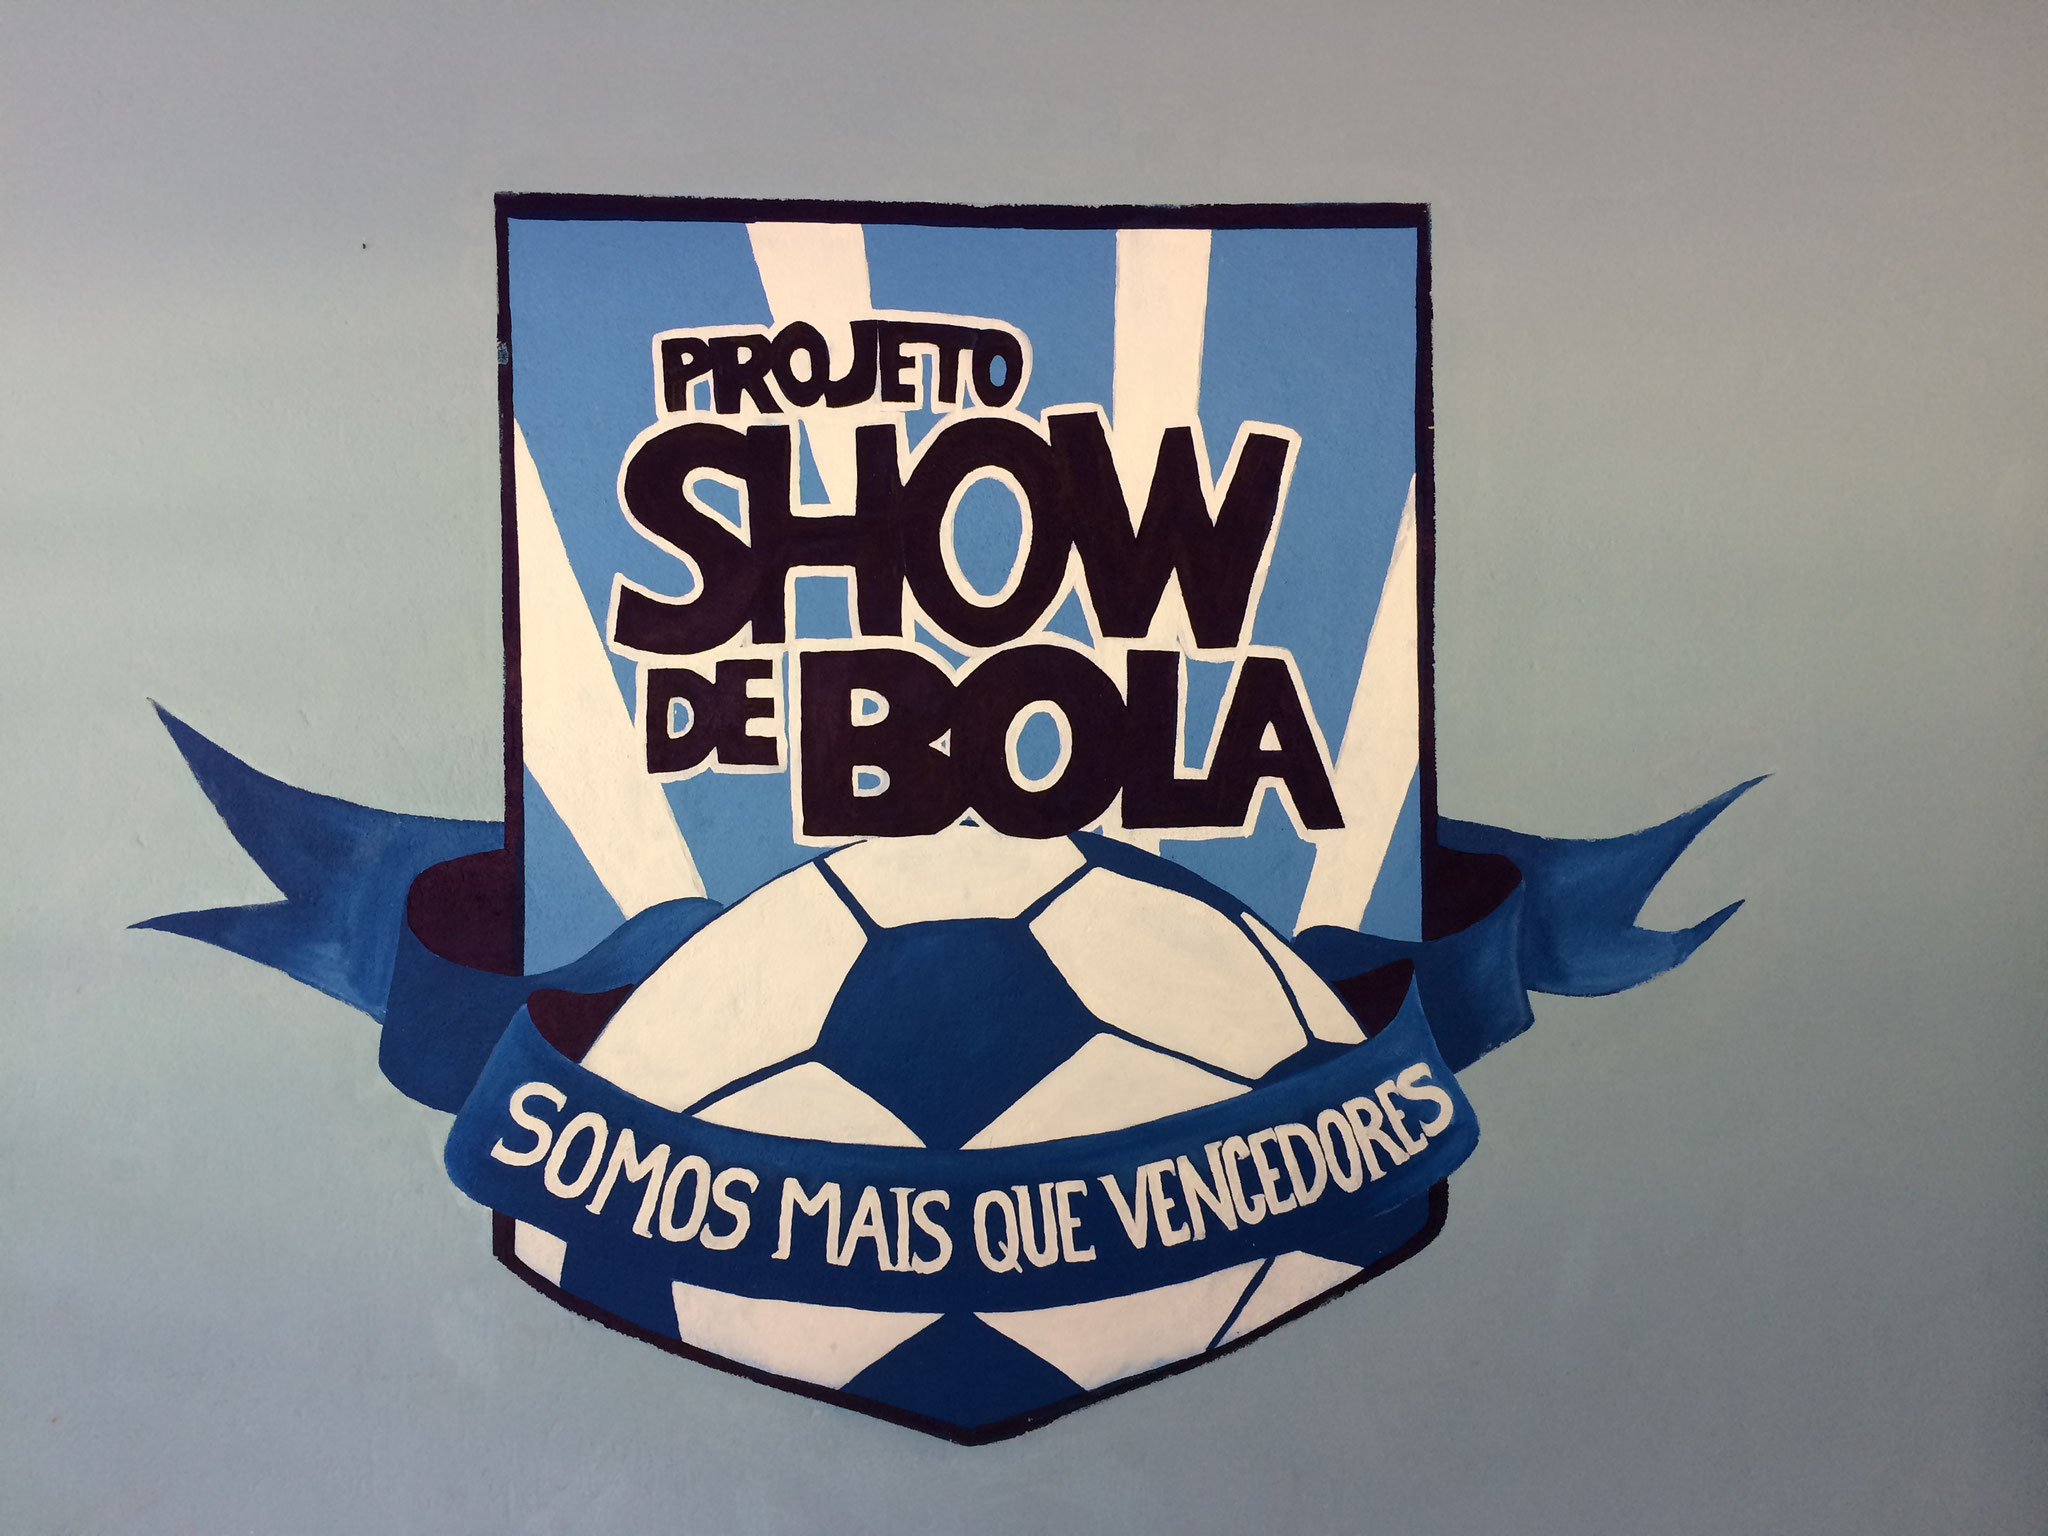 Show de Bola: Logo